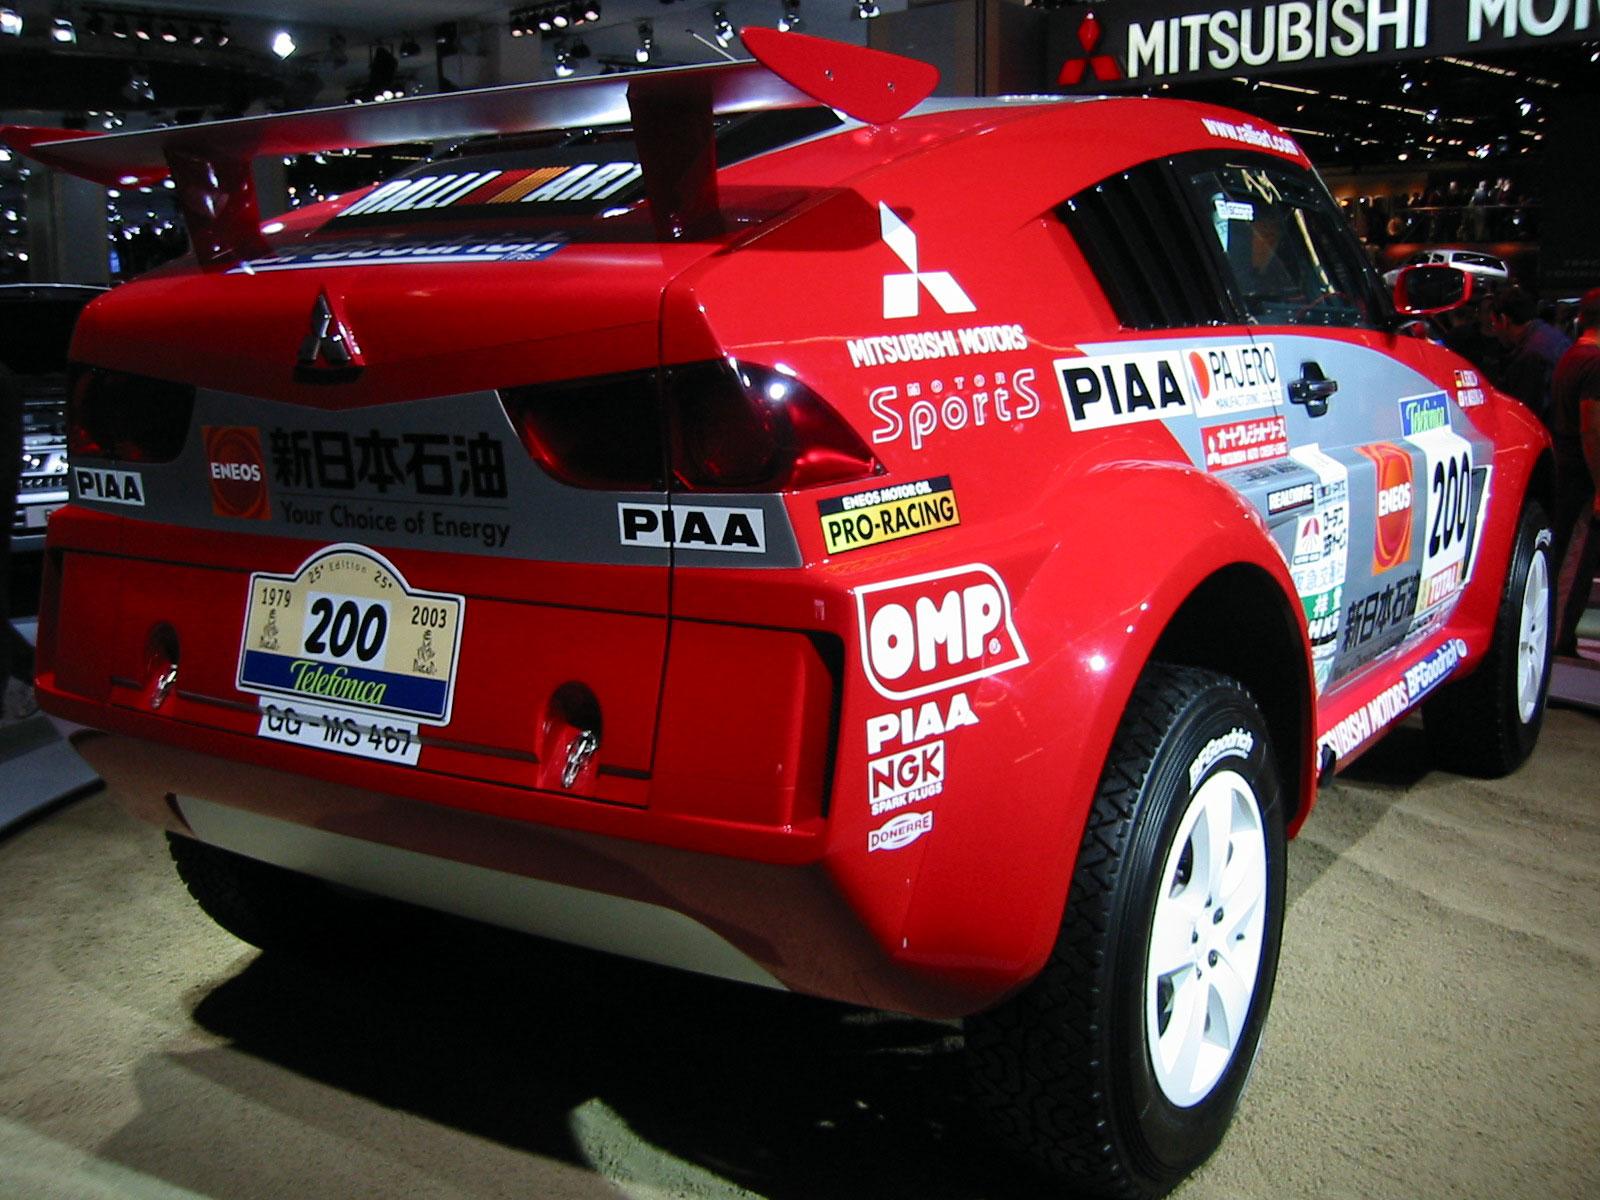 Mitsubishi Pajero Dakar Technical Details History Photos